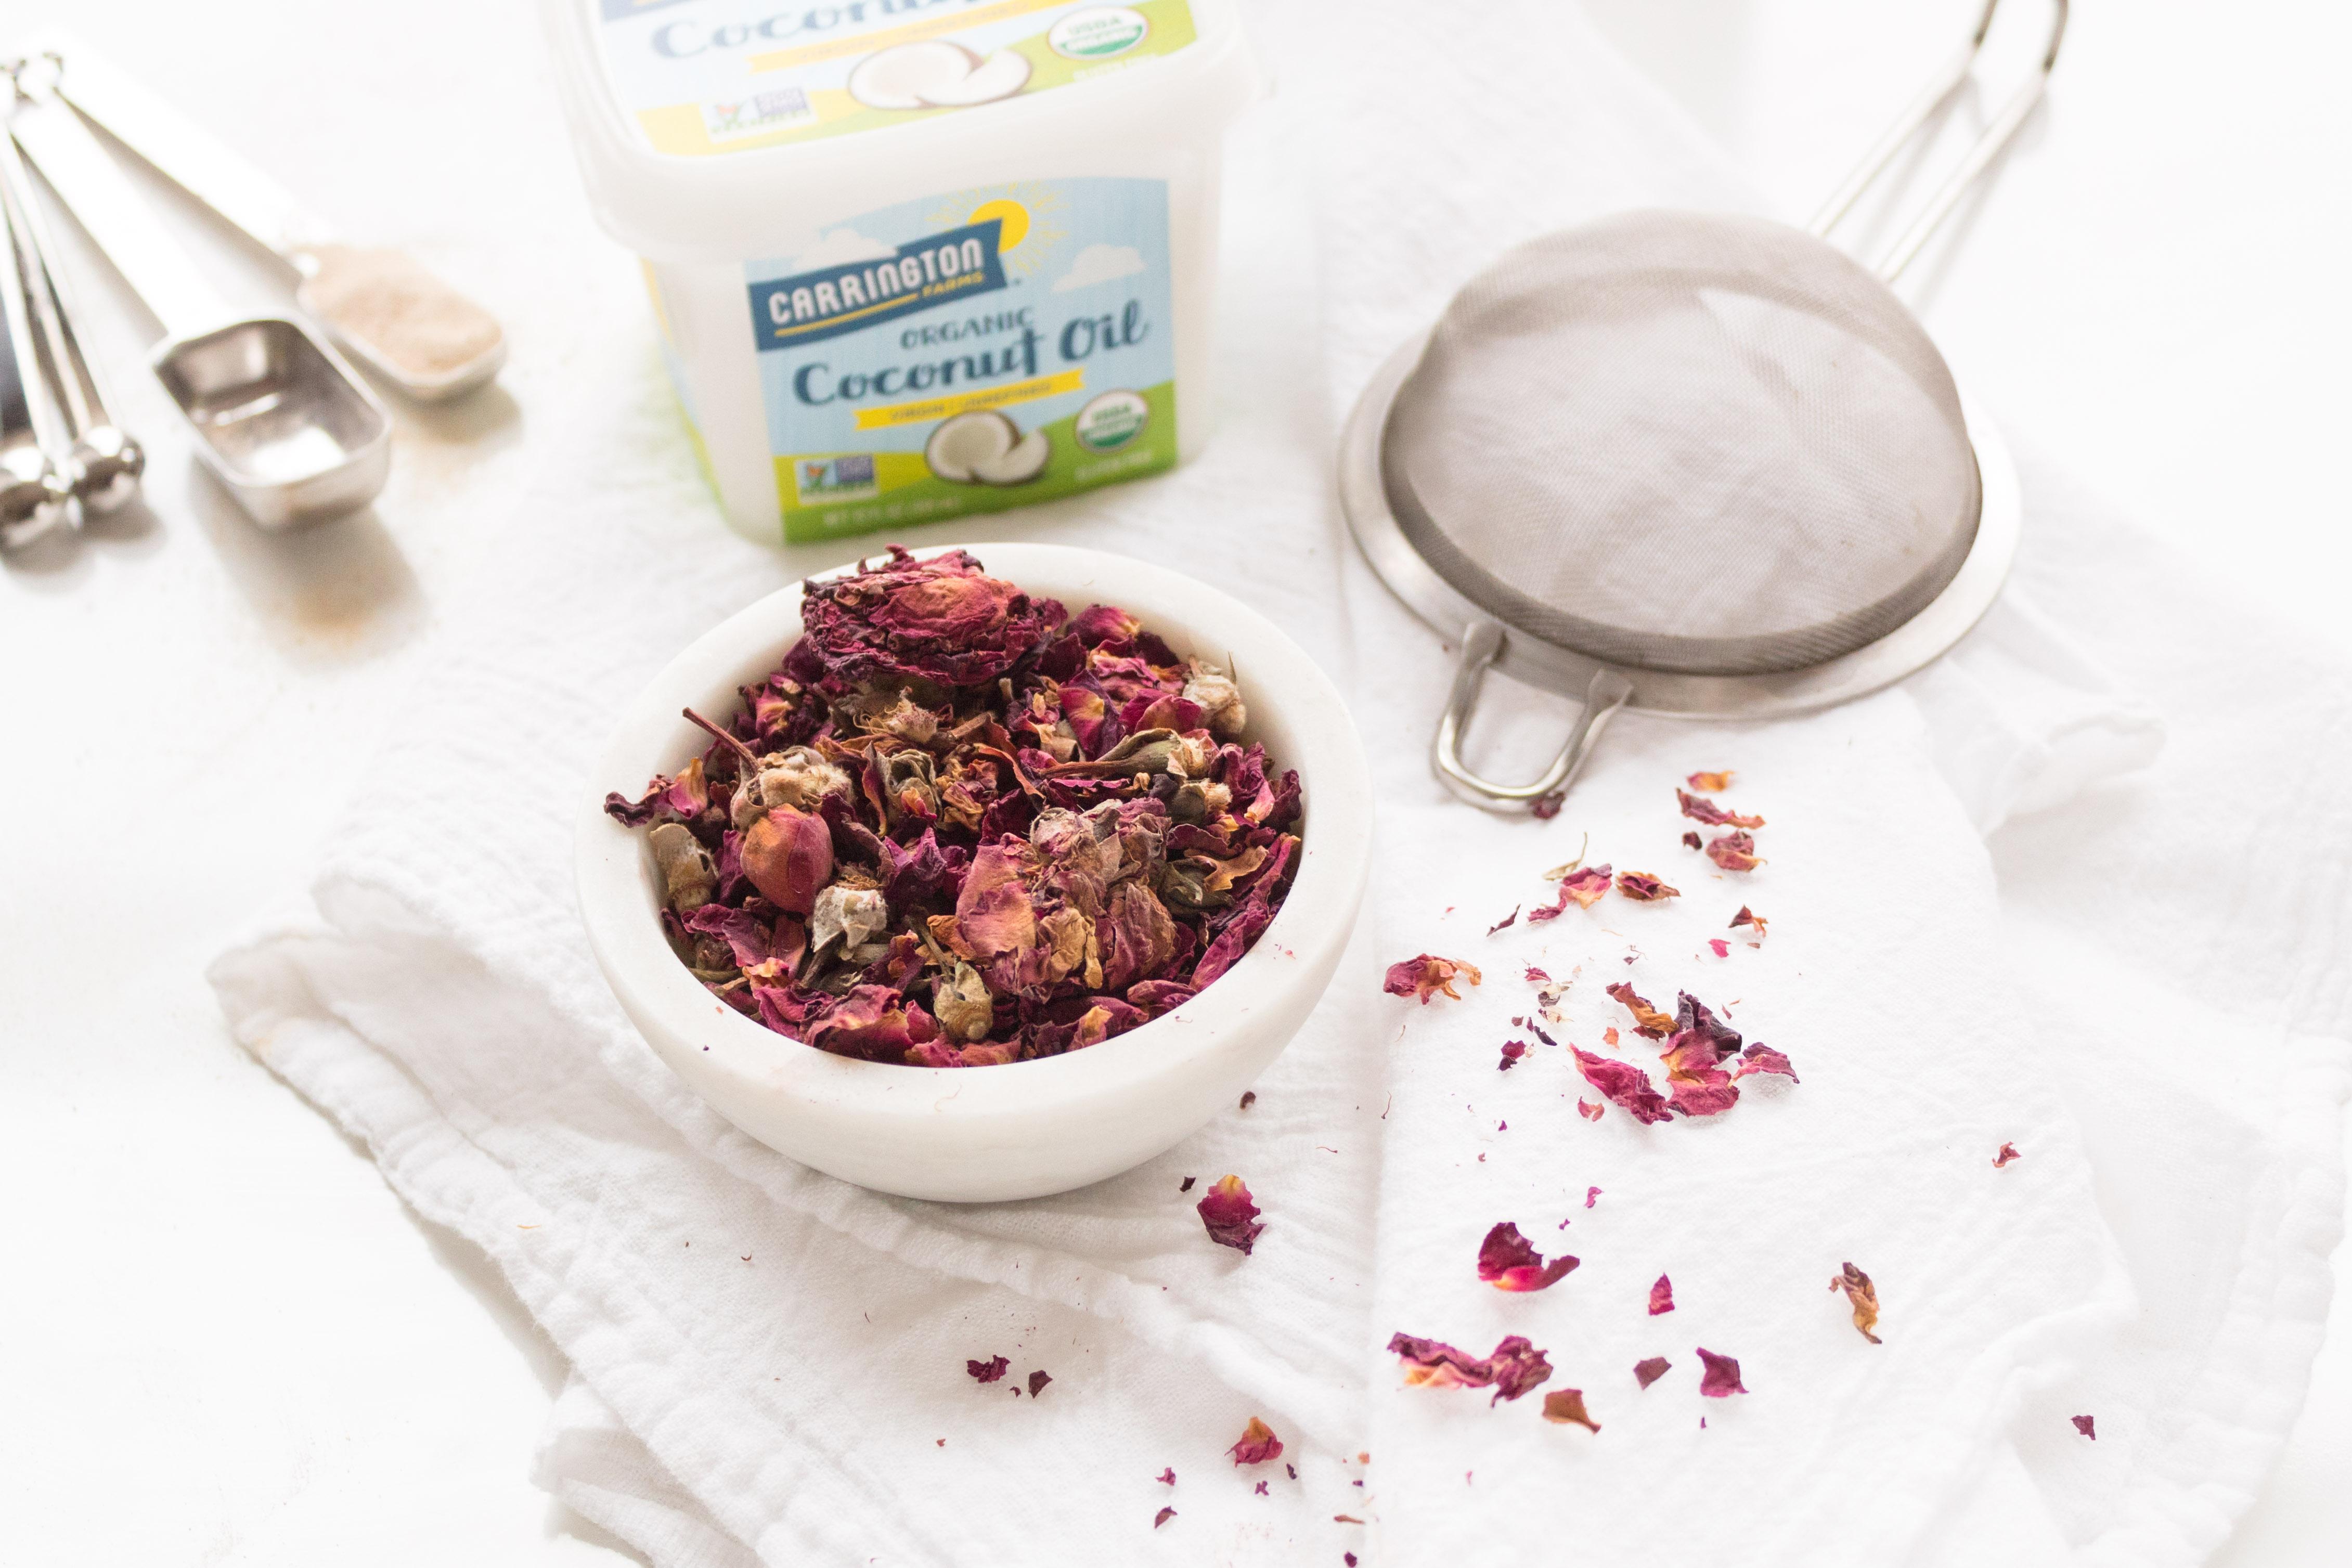 Kerri Axelrod rose tea with Carrington Farms Coconut Oil and Mountain Rose Herbs